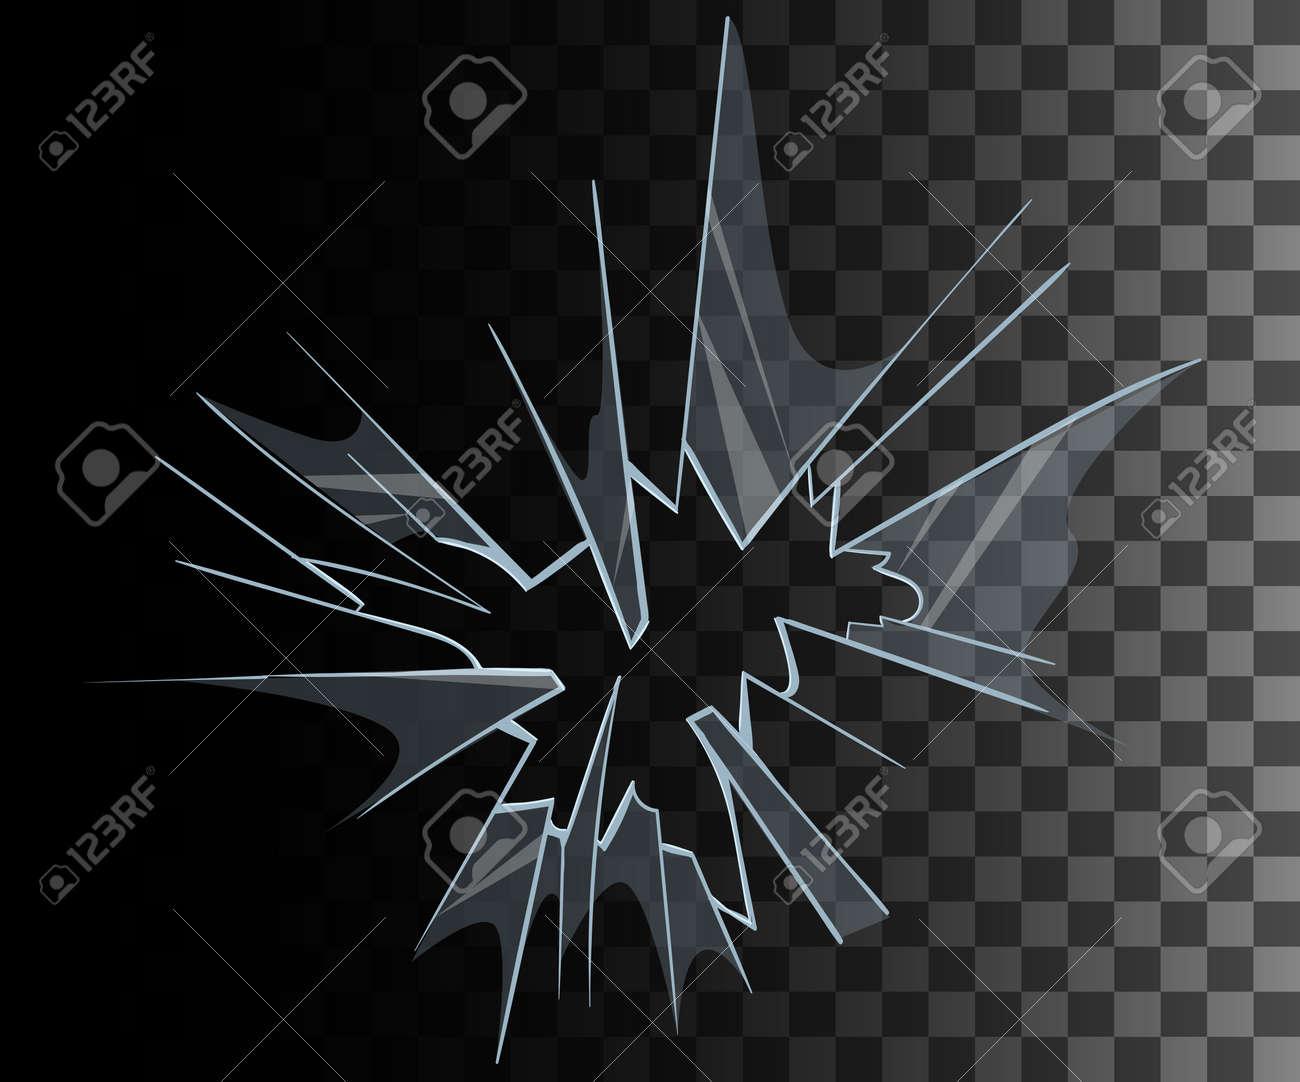 Broken glass set broken glass background collection royalty free broken glass set broken glass background collection stock vector 58130634 voltagebd Gallery